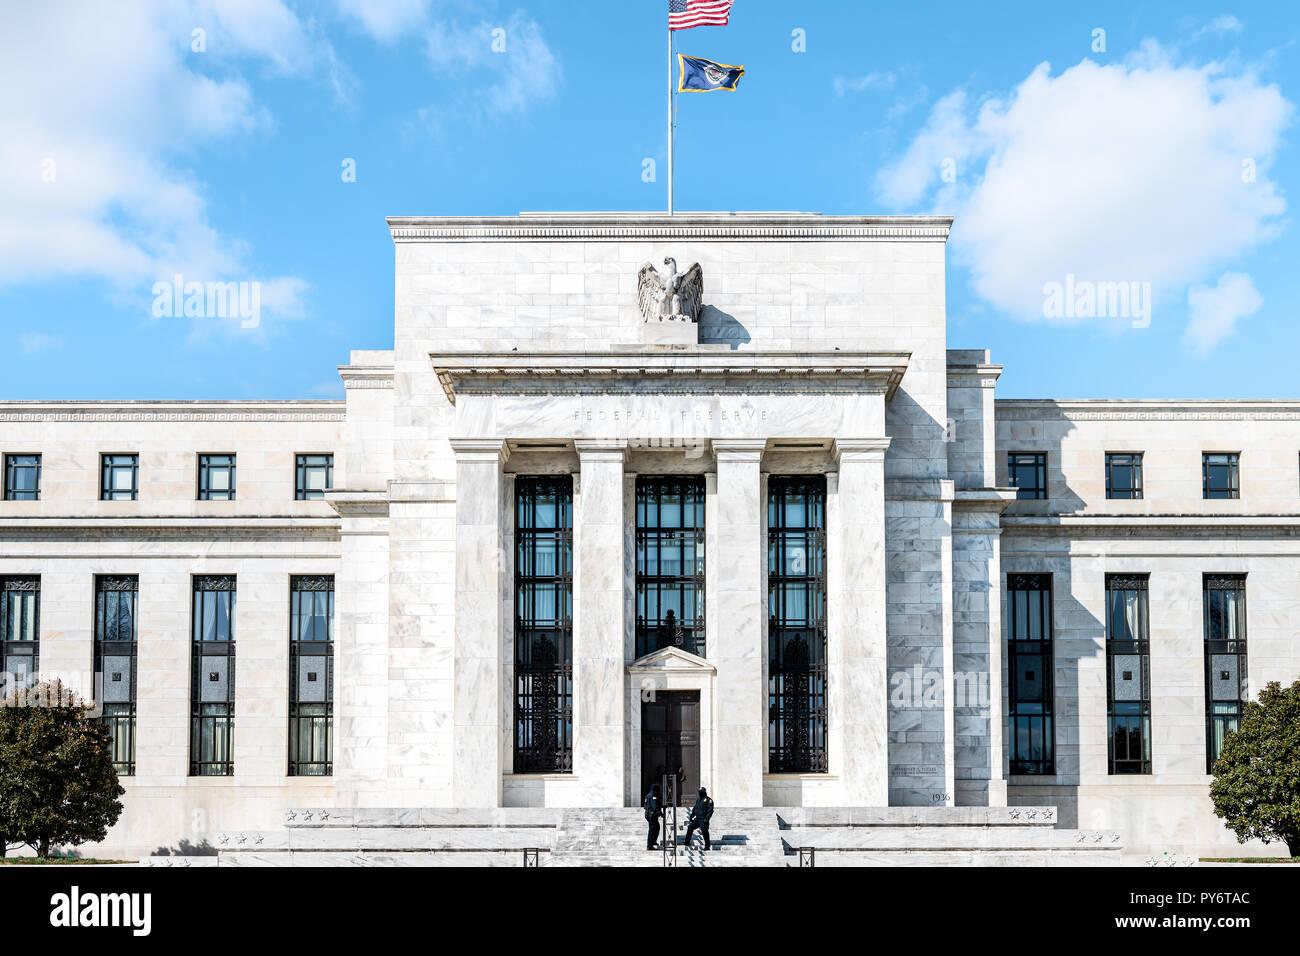 Washington DC, USA - March 9, 2018: Federal Reserve bank